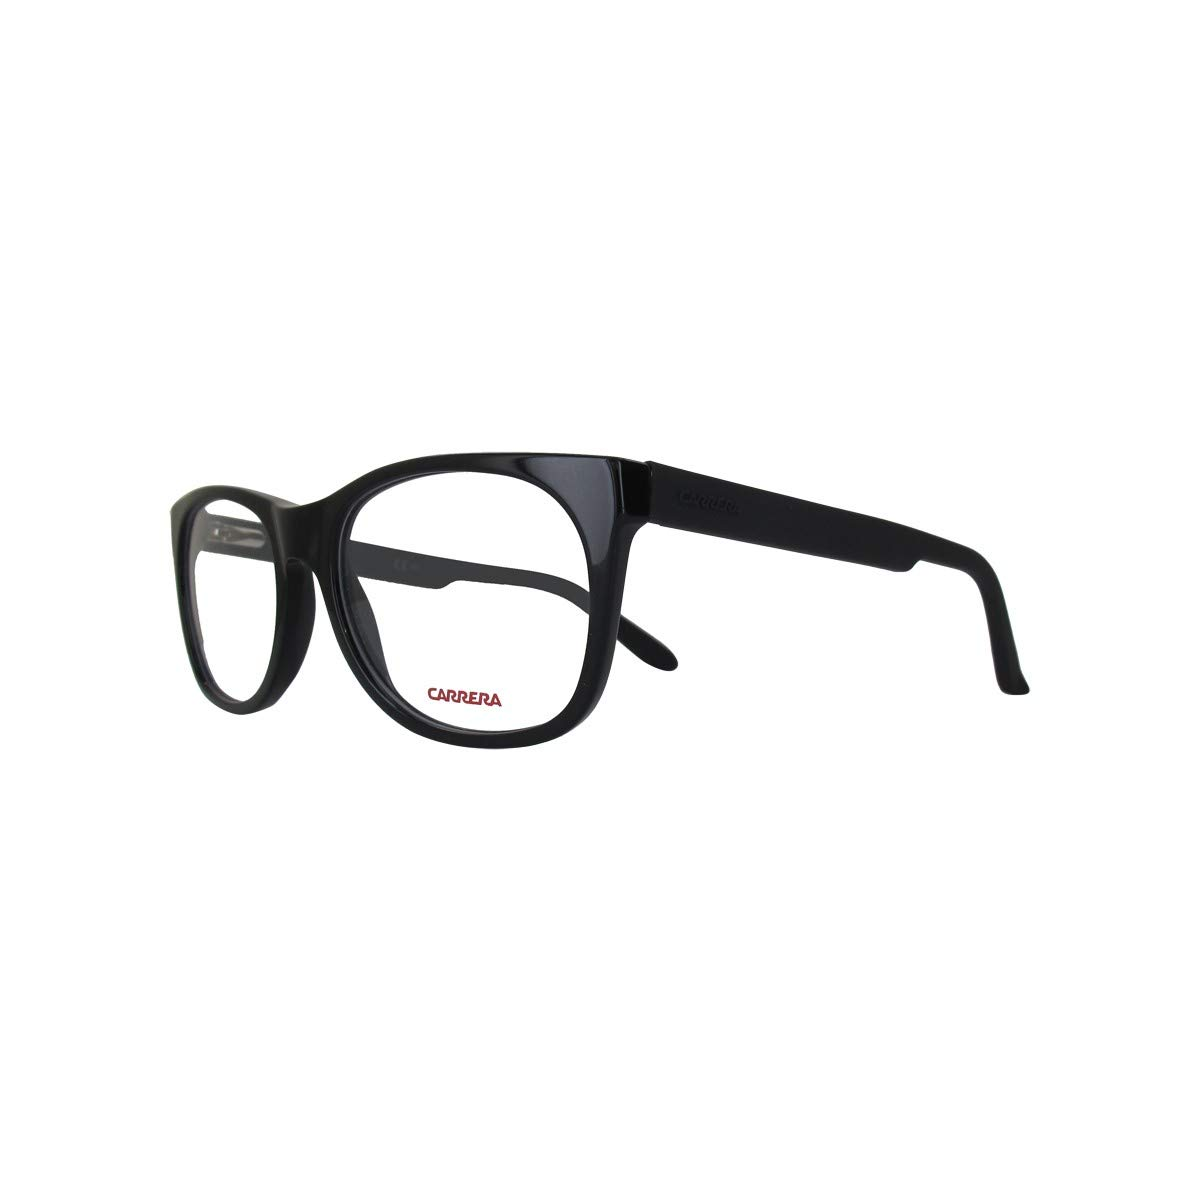 Matte Black Frame Black Carrera 6652 Eyeglass Frames CA6652-0KUN-5318 Lens Diameter 53mm,